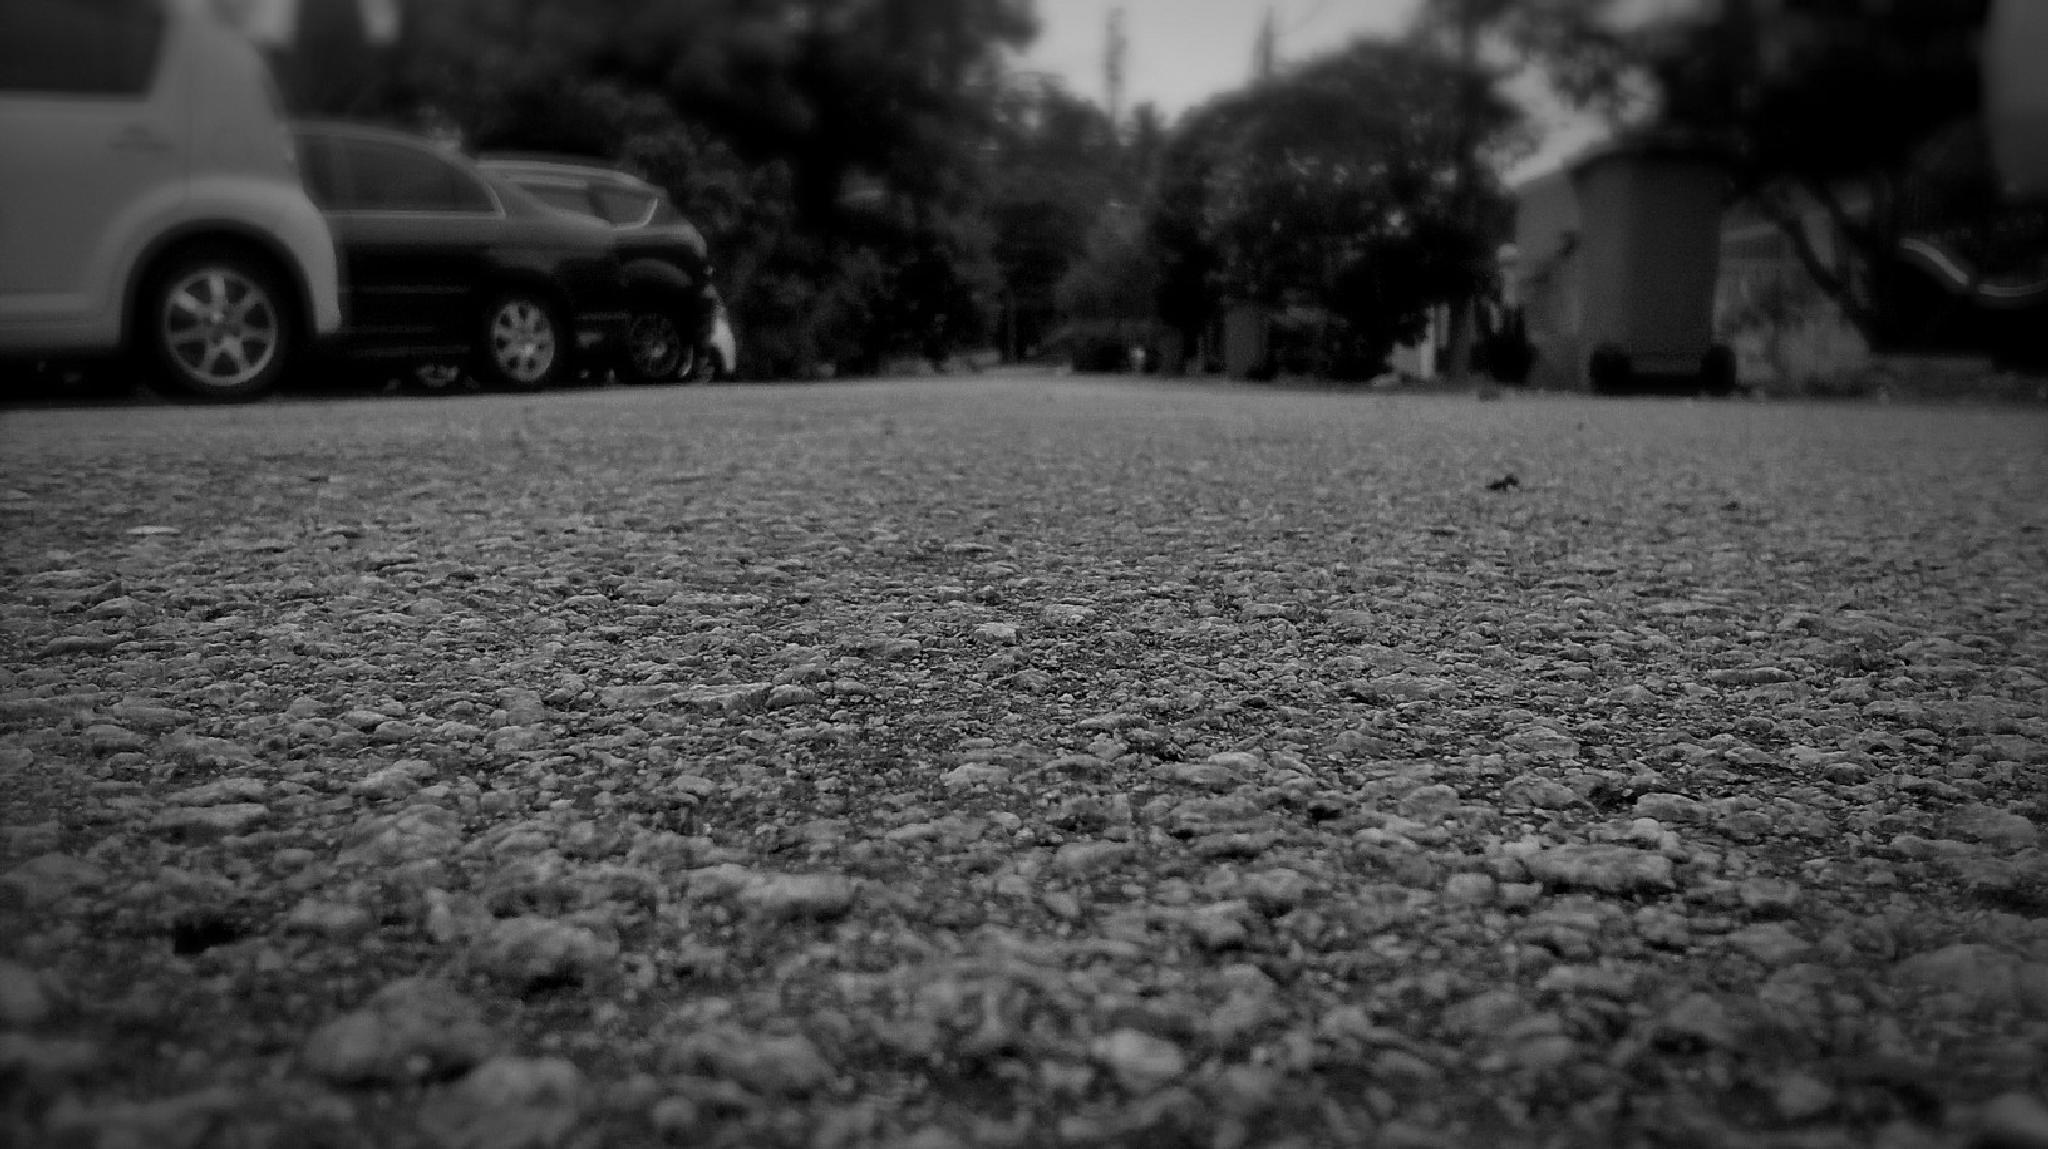 Just A Random Shot On My Street by Dharshanth Kumar